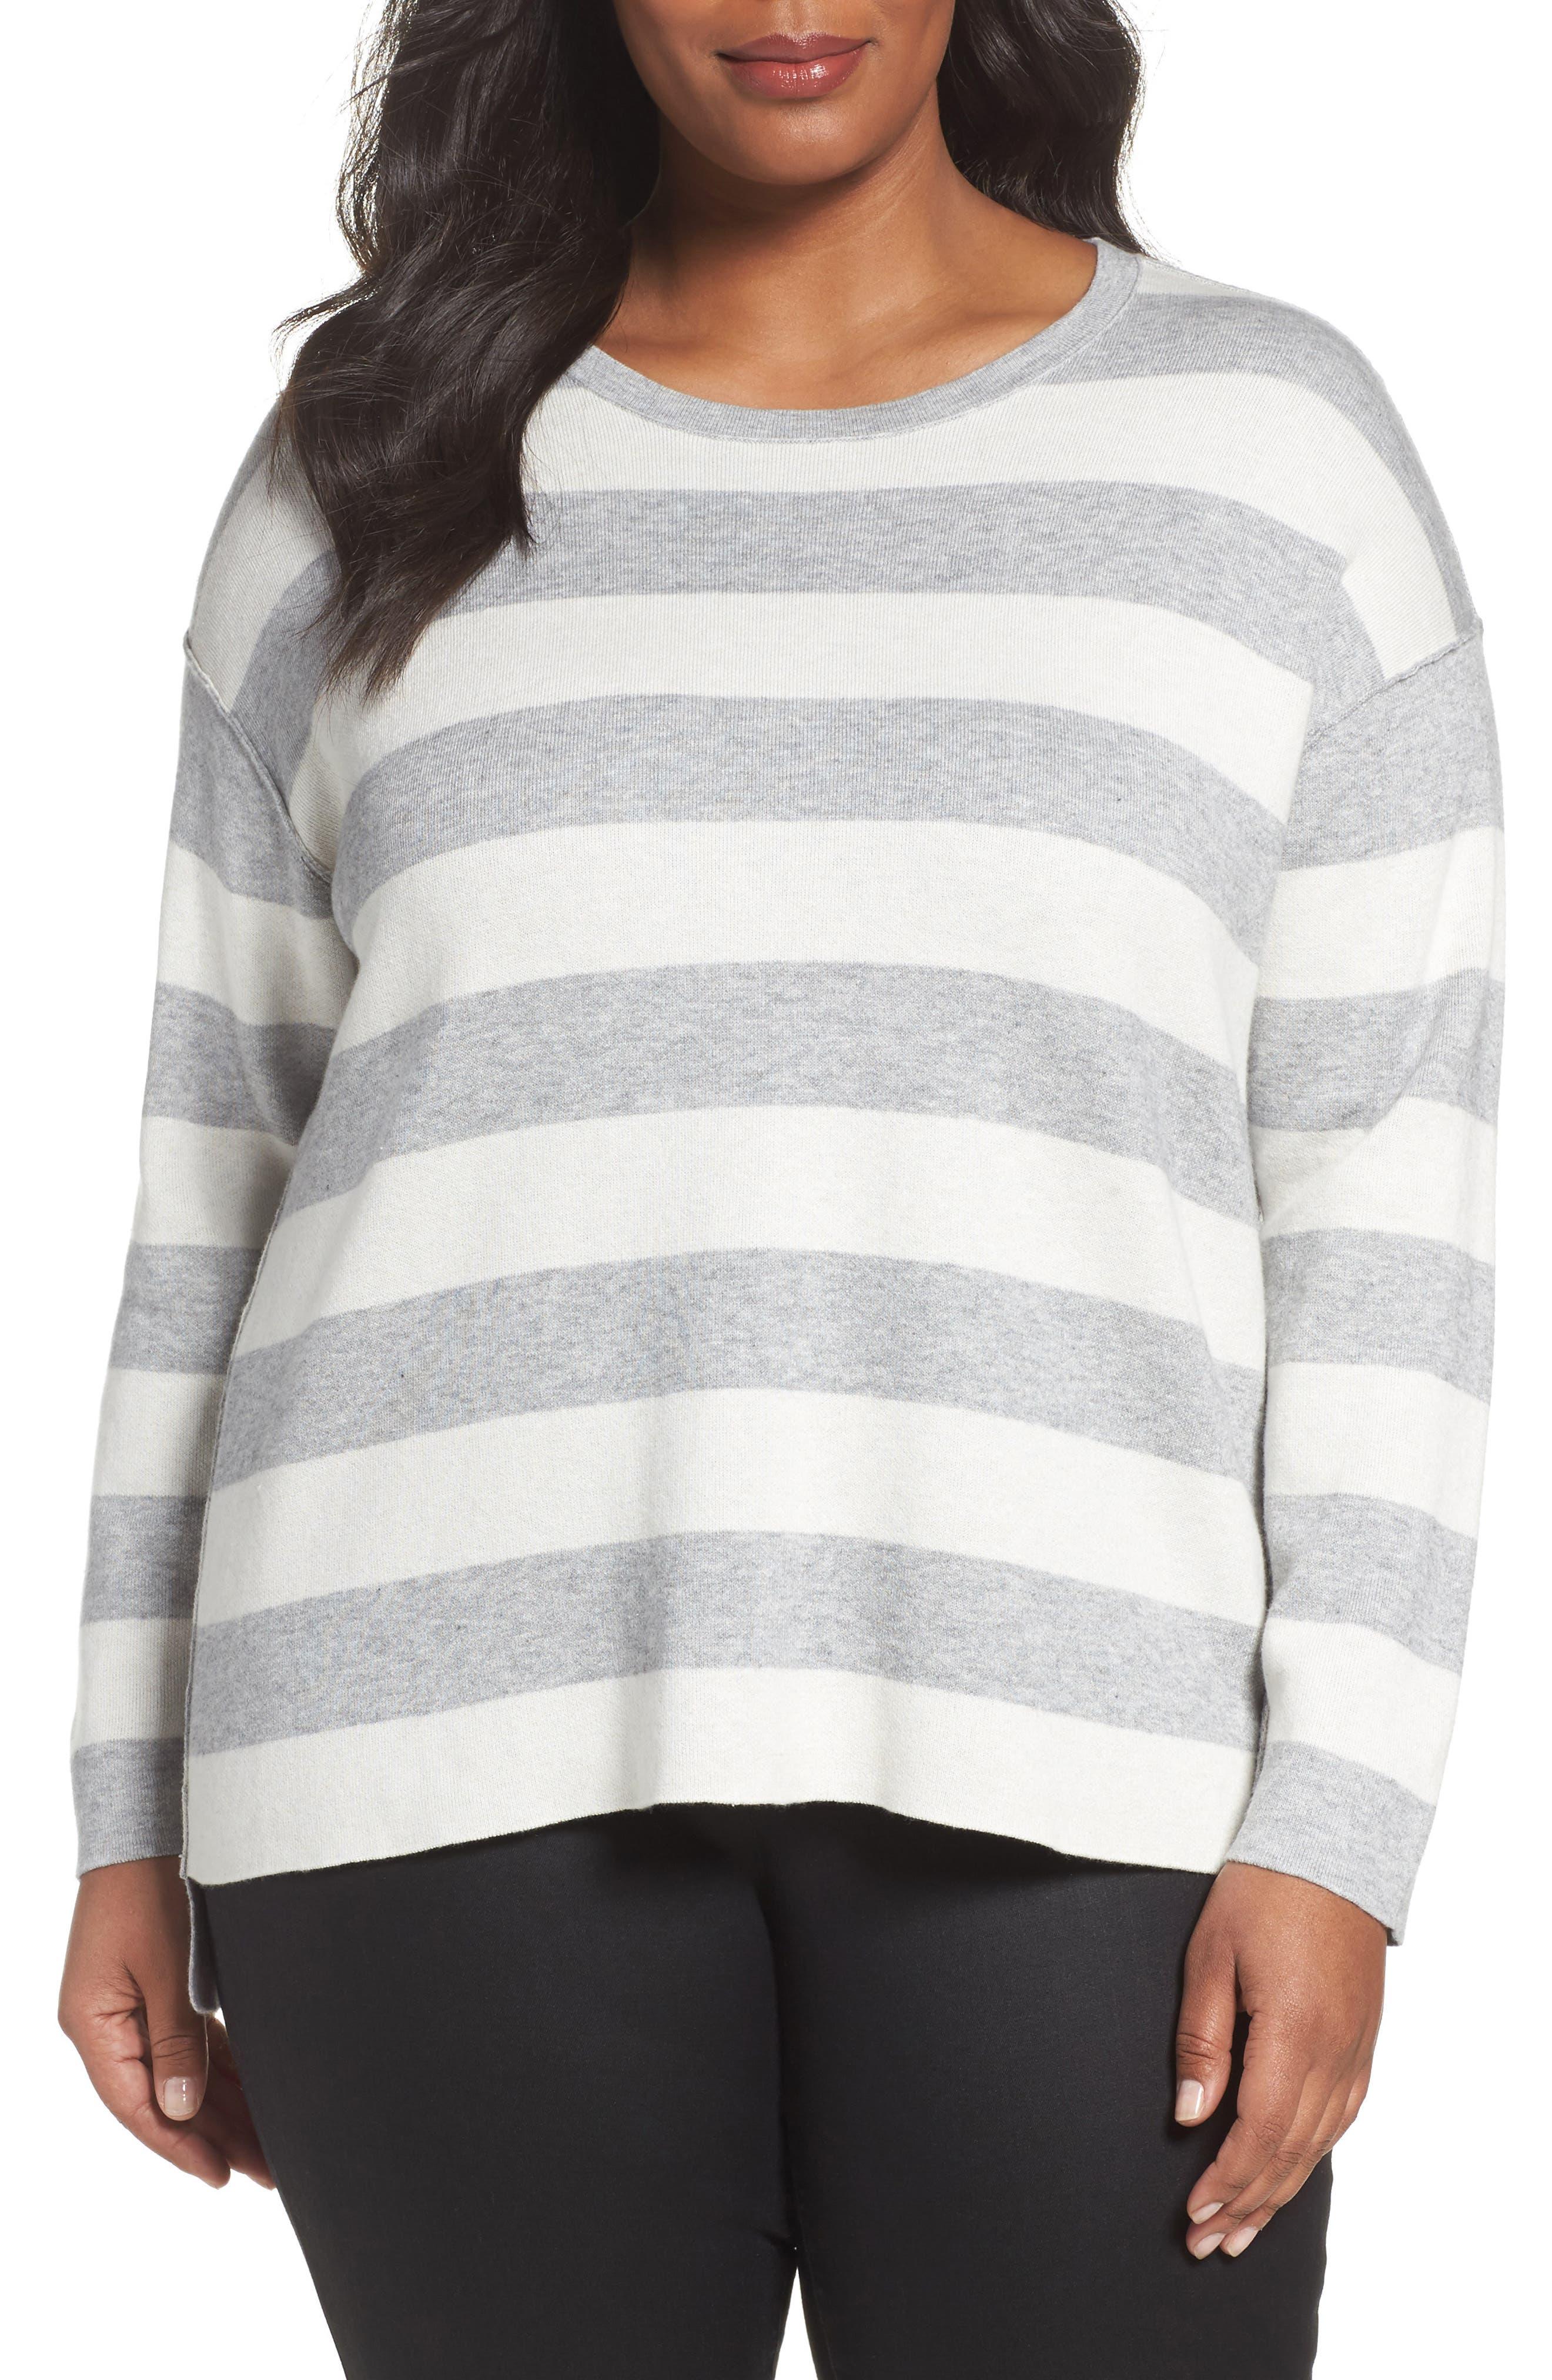 Main Image - Eileen Fisher Stripe Organic Cotton Blend Top (Plus Size)